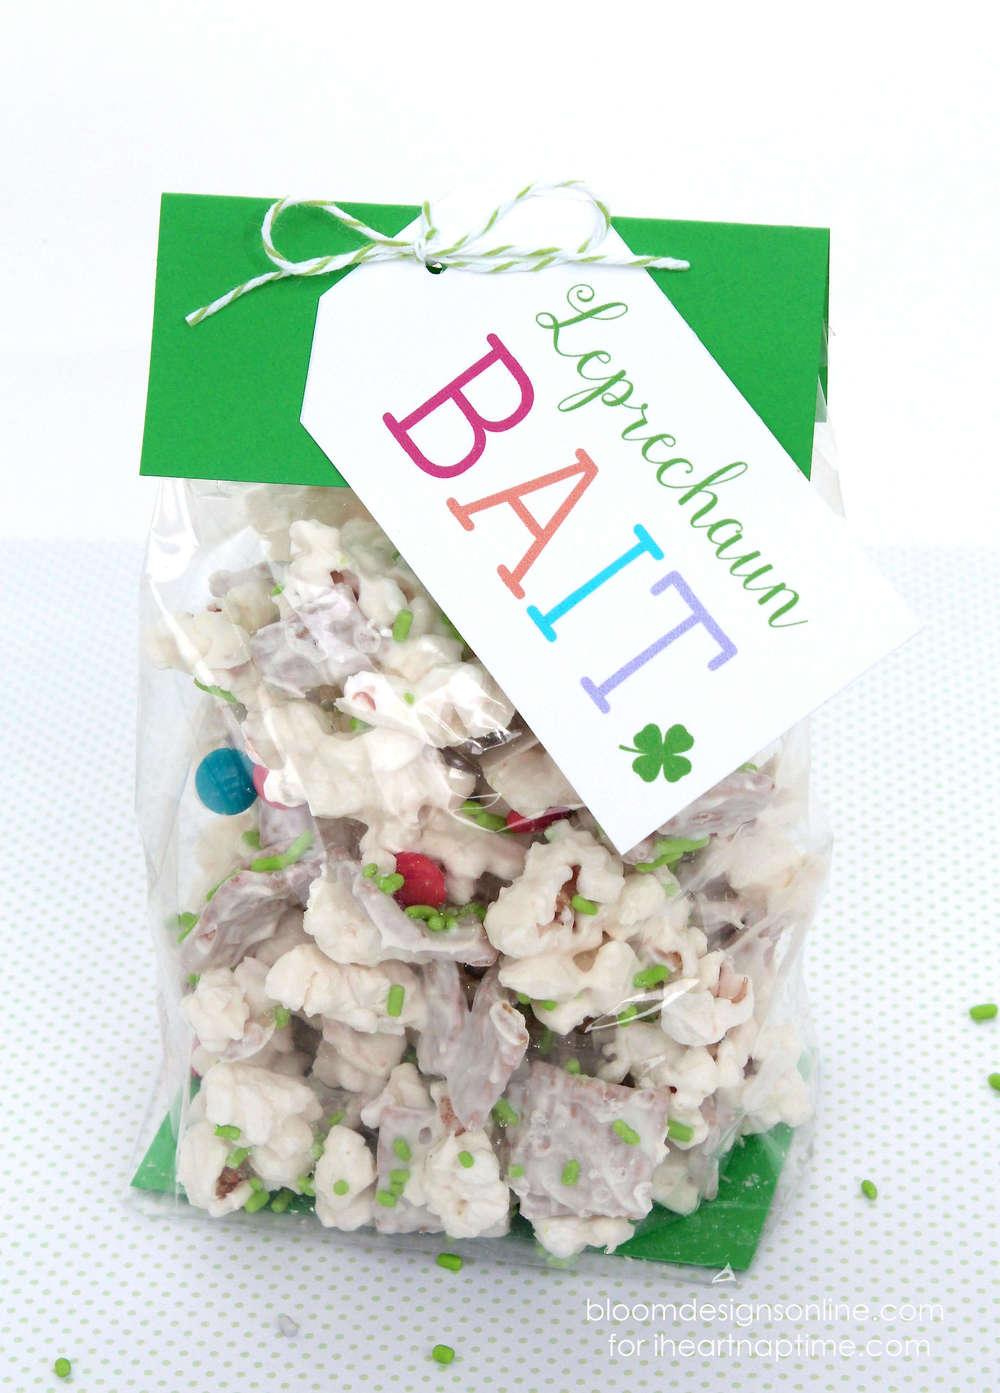 Leprechaun bait with free printables -cute idea for kids on Saint Patrick's Day!